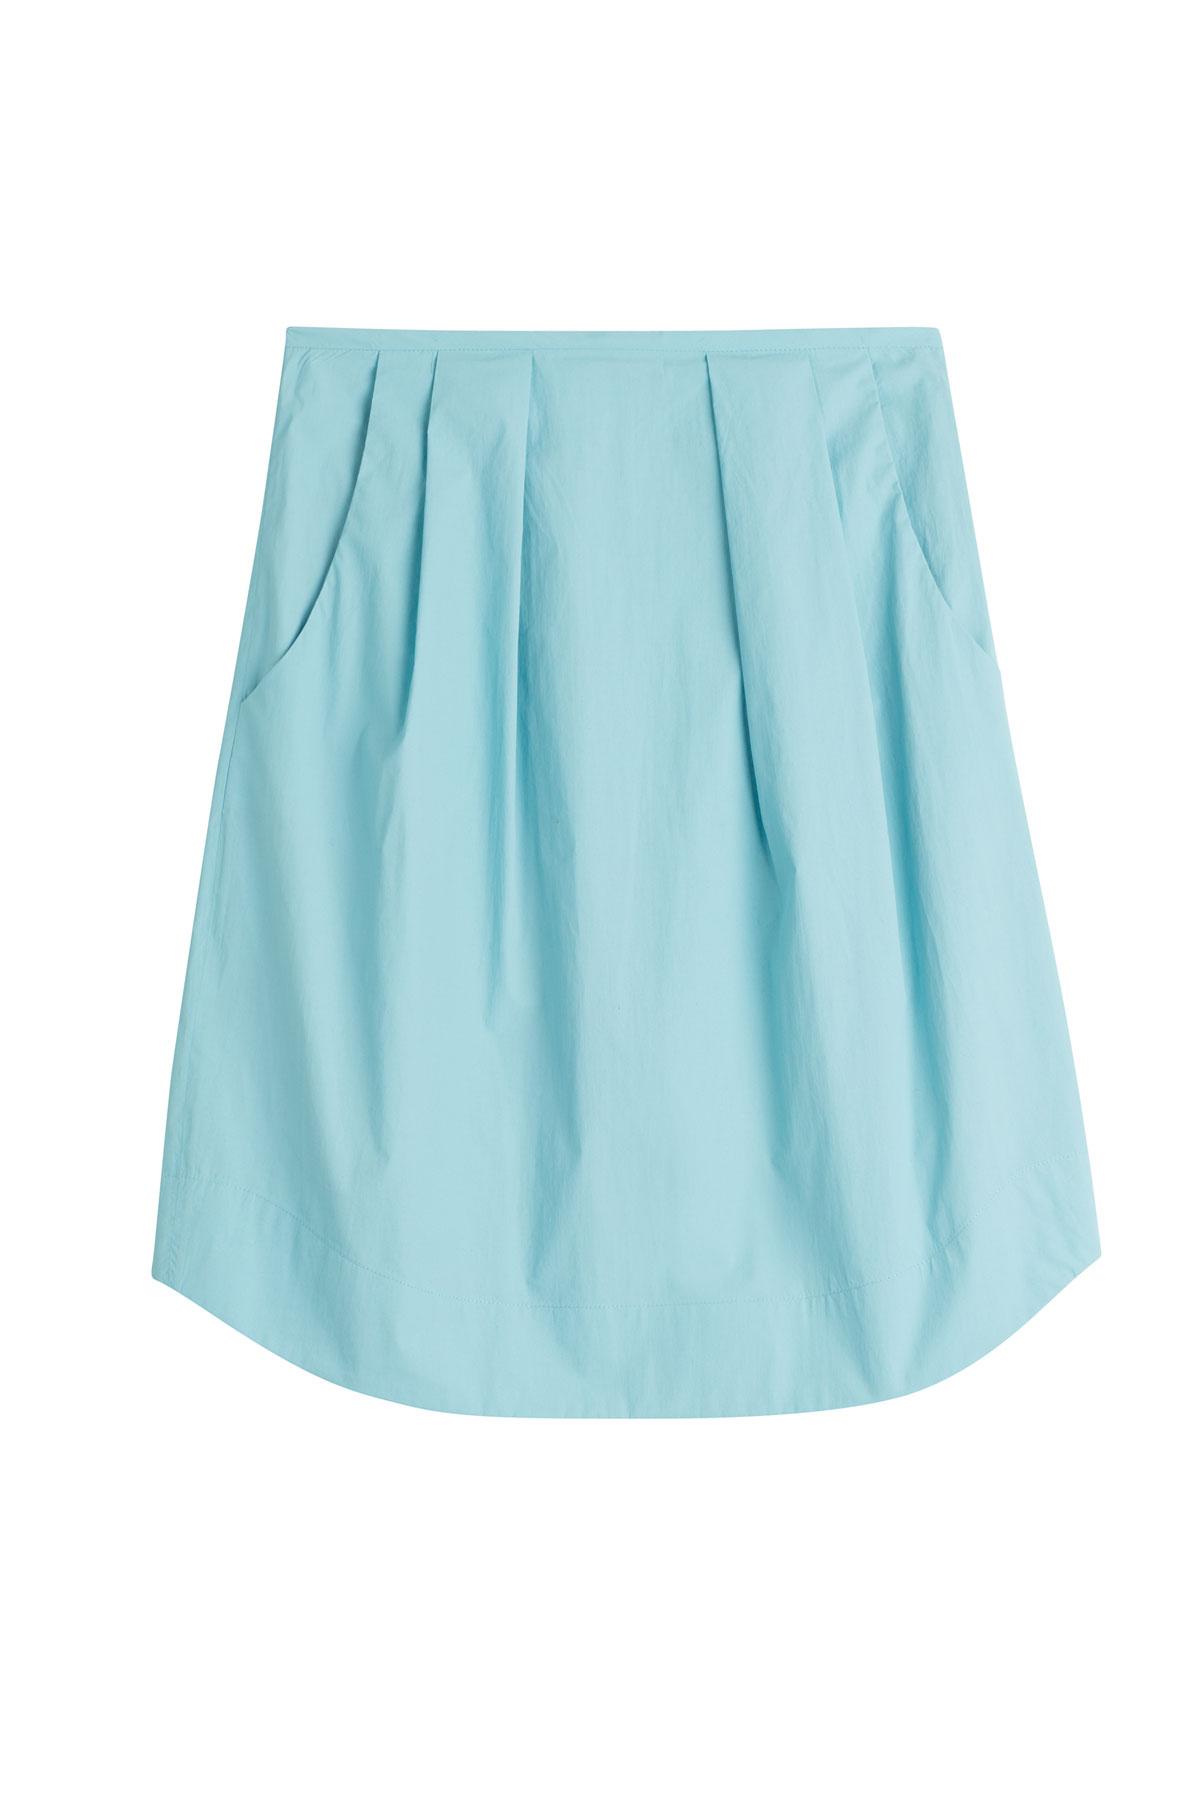 jil sander navy cotton skirt turquoise in blue lyst